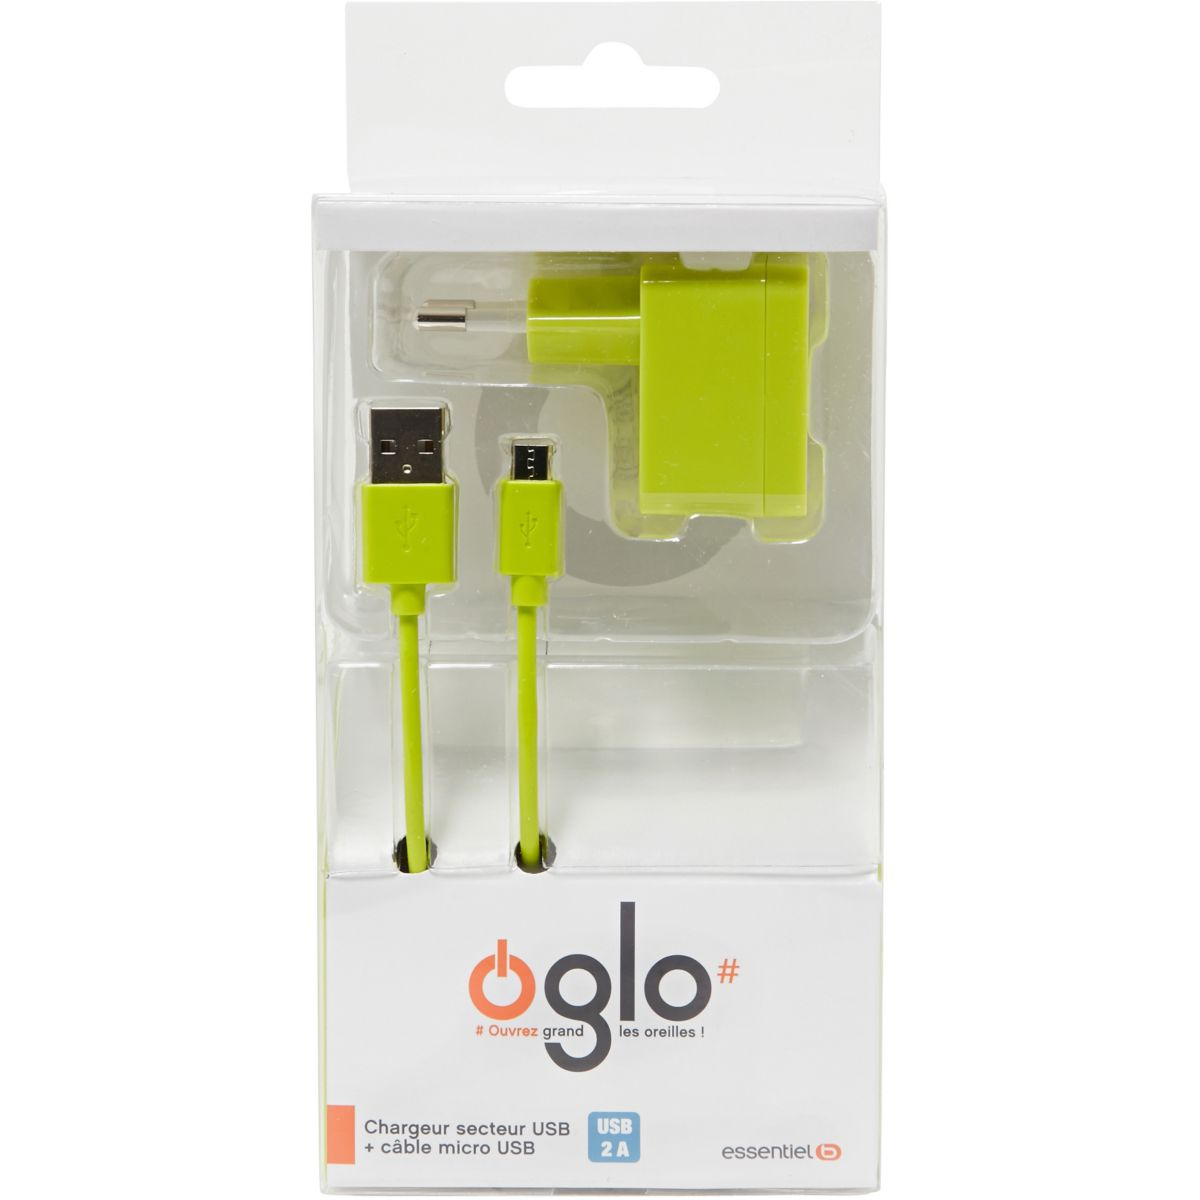 Chargeur enceinte oglo# micro usb + c�ble usb vert (photo)